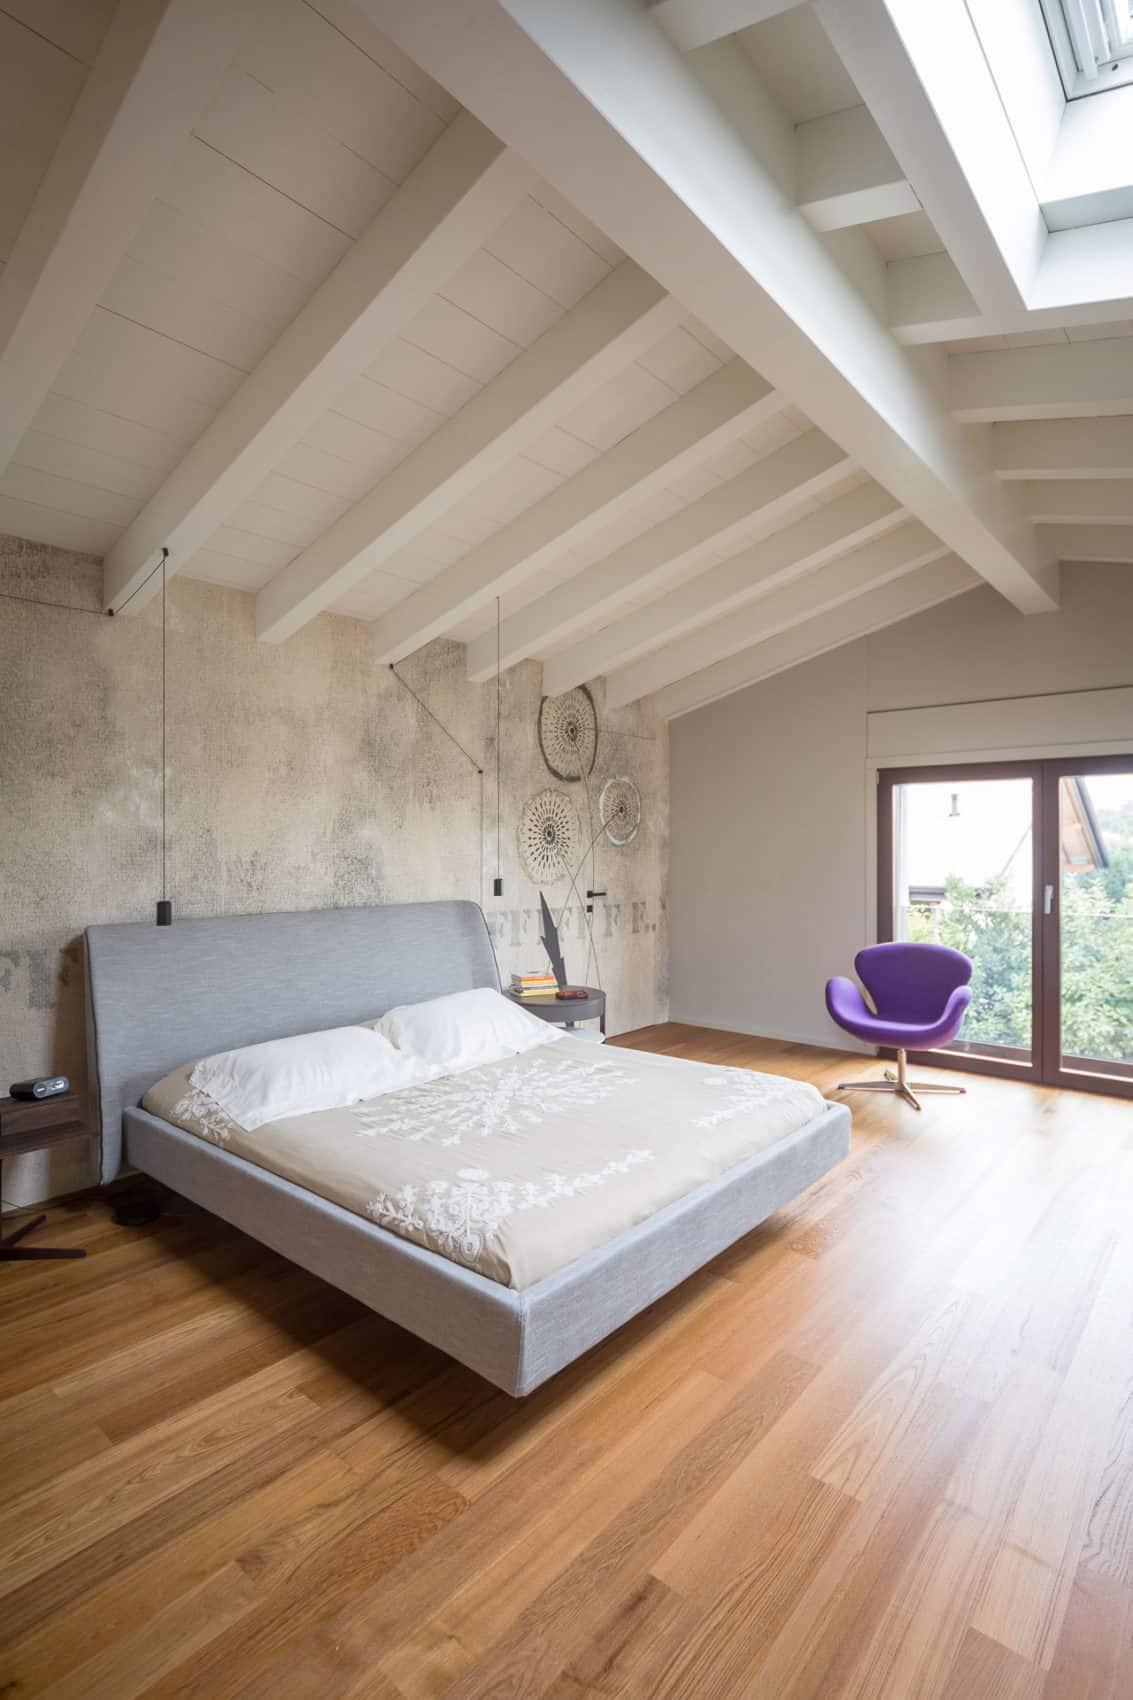 Villa NB by Architettura & Urbanistica Sigurtà (14)